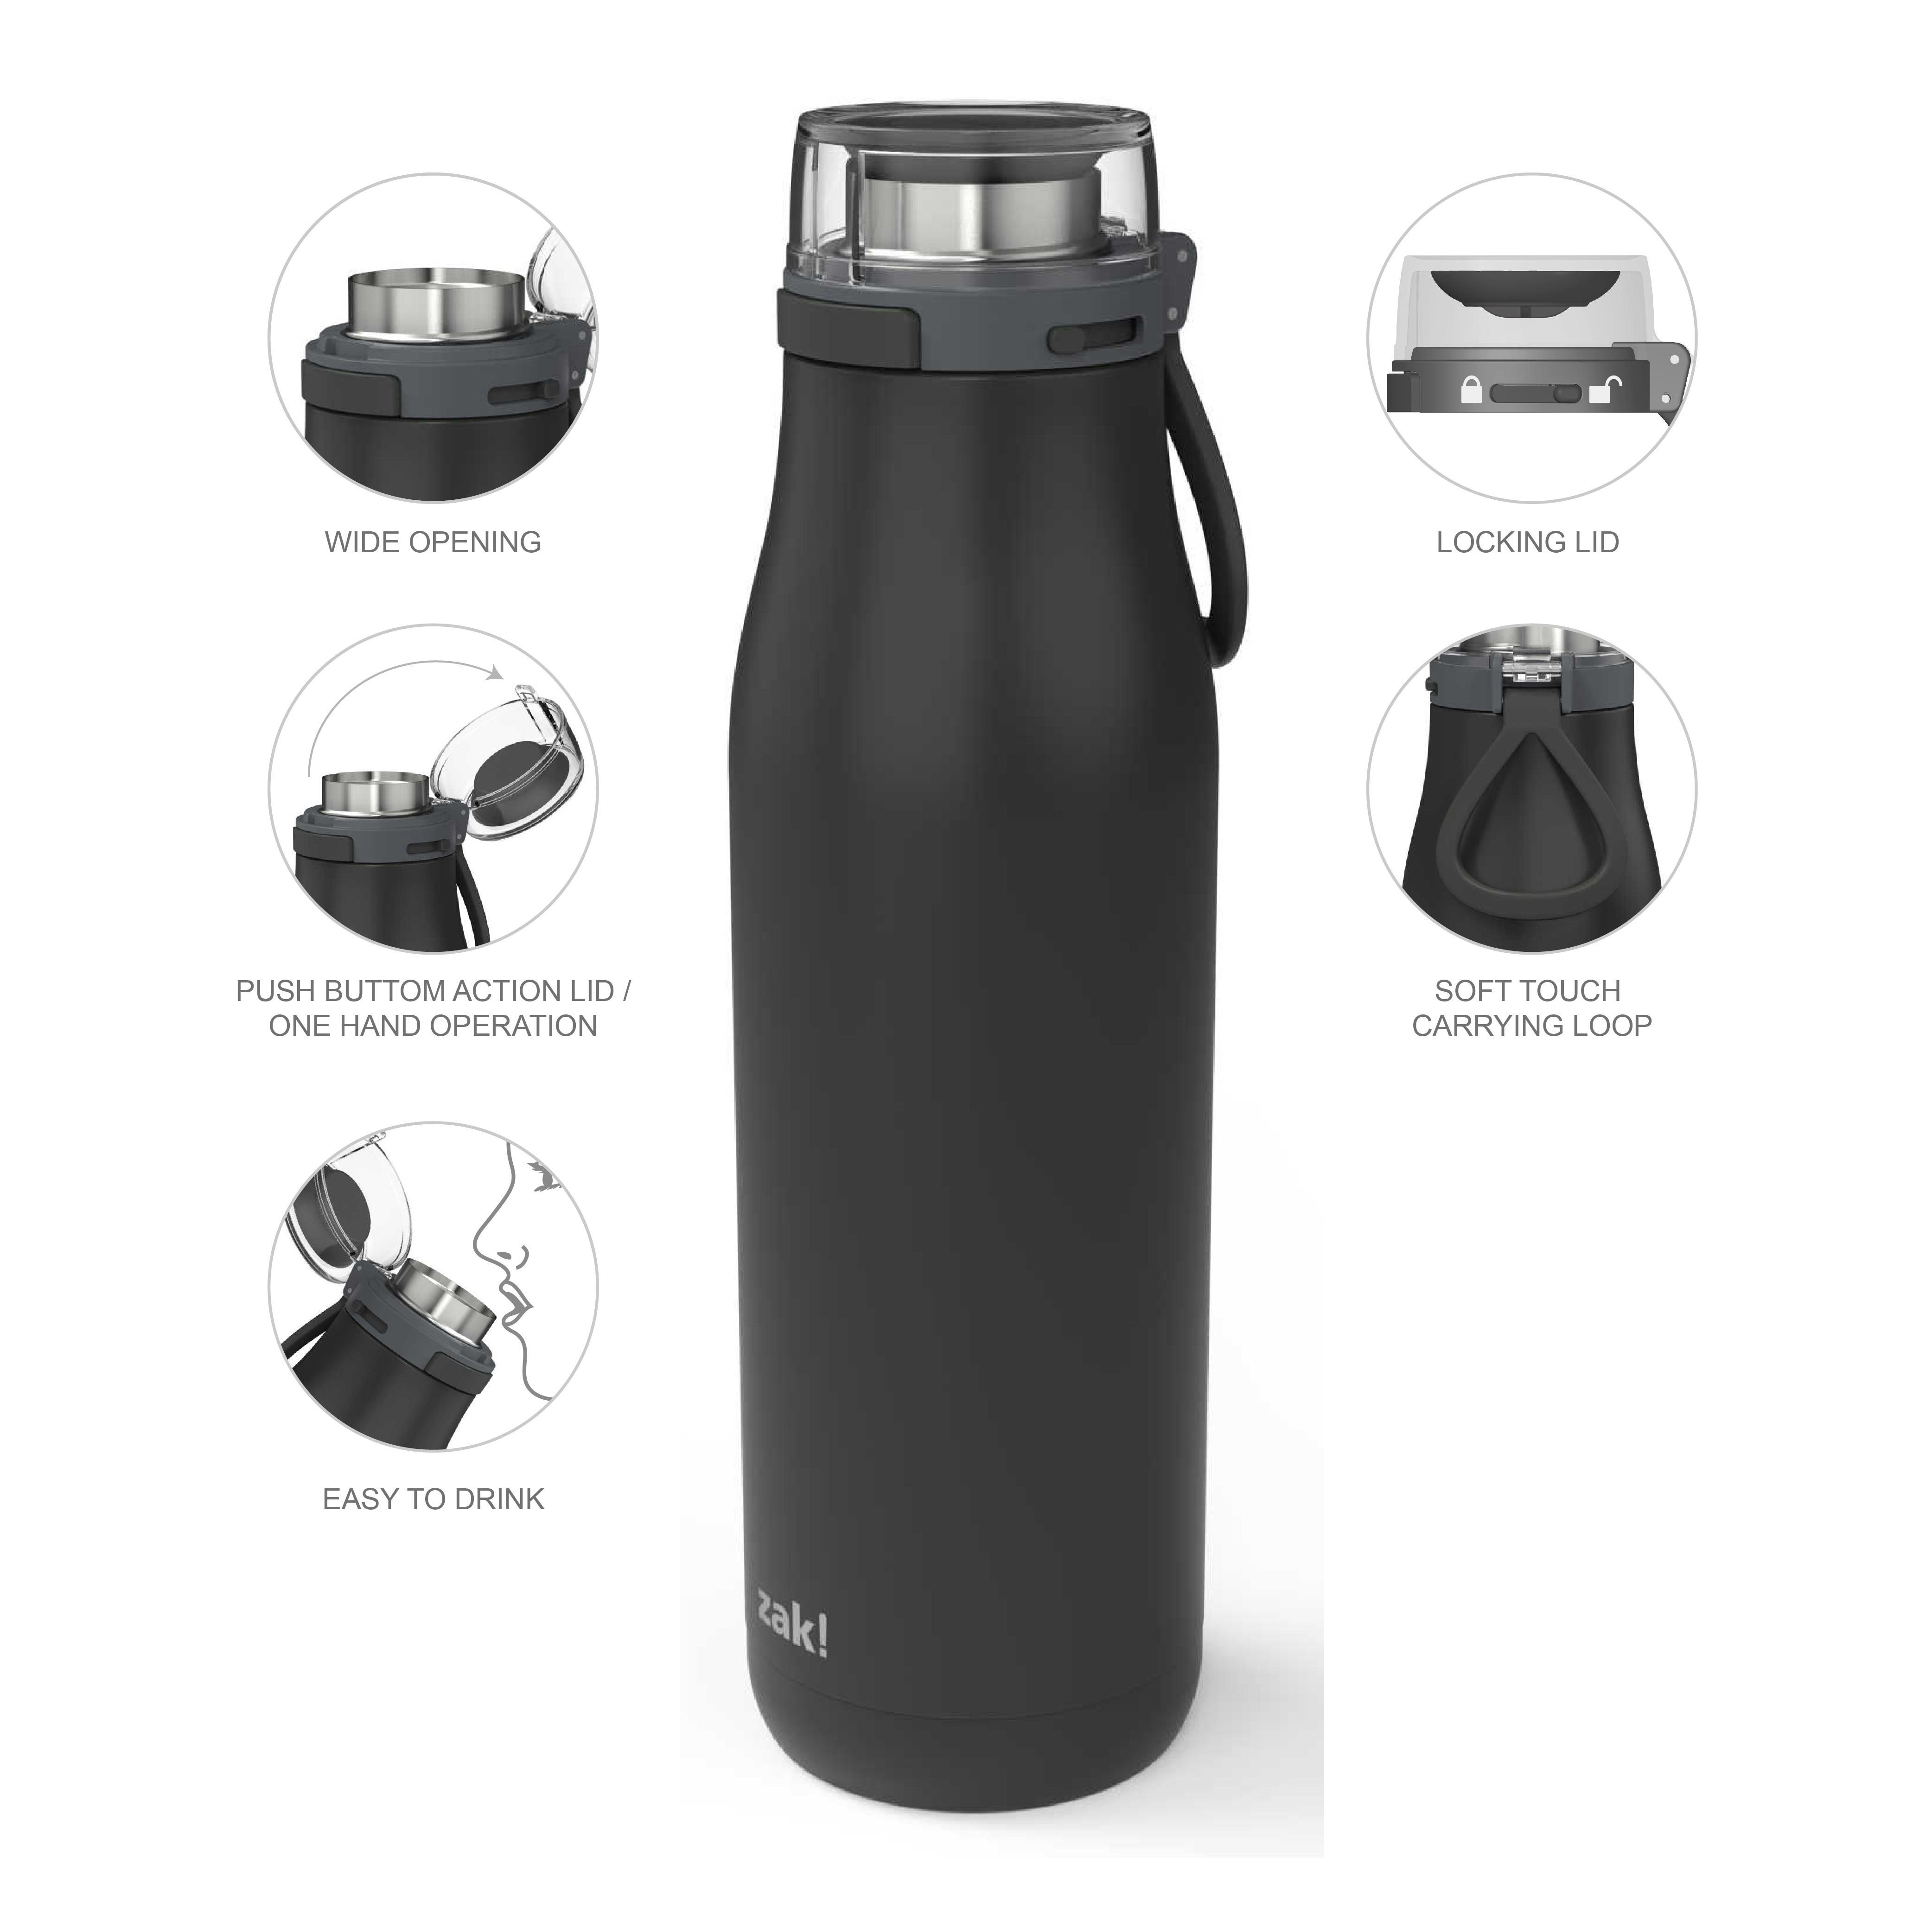 Kiona 29 ounce Vacuum Insulated Stainless Steel Tumbler, Indigo slideshow image 6